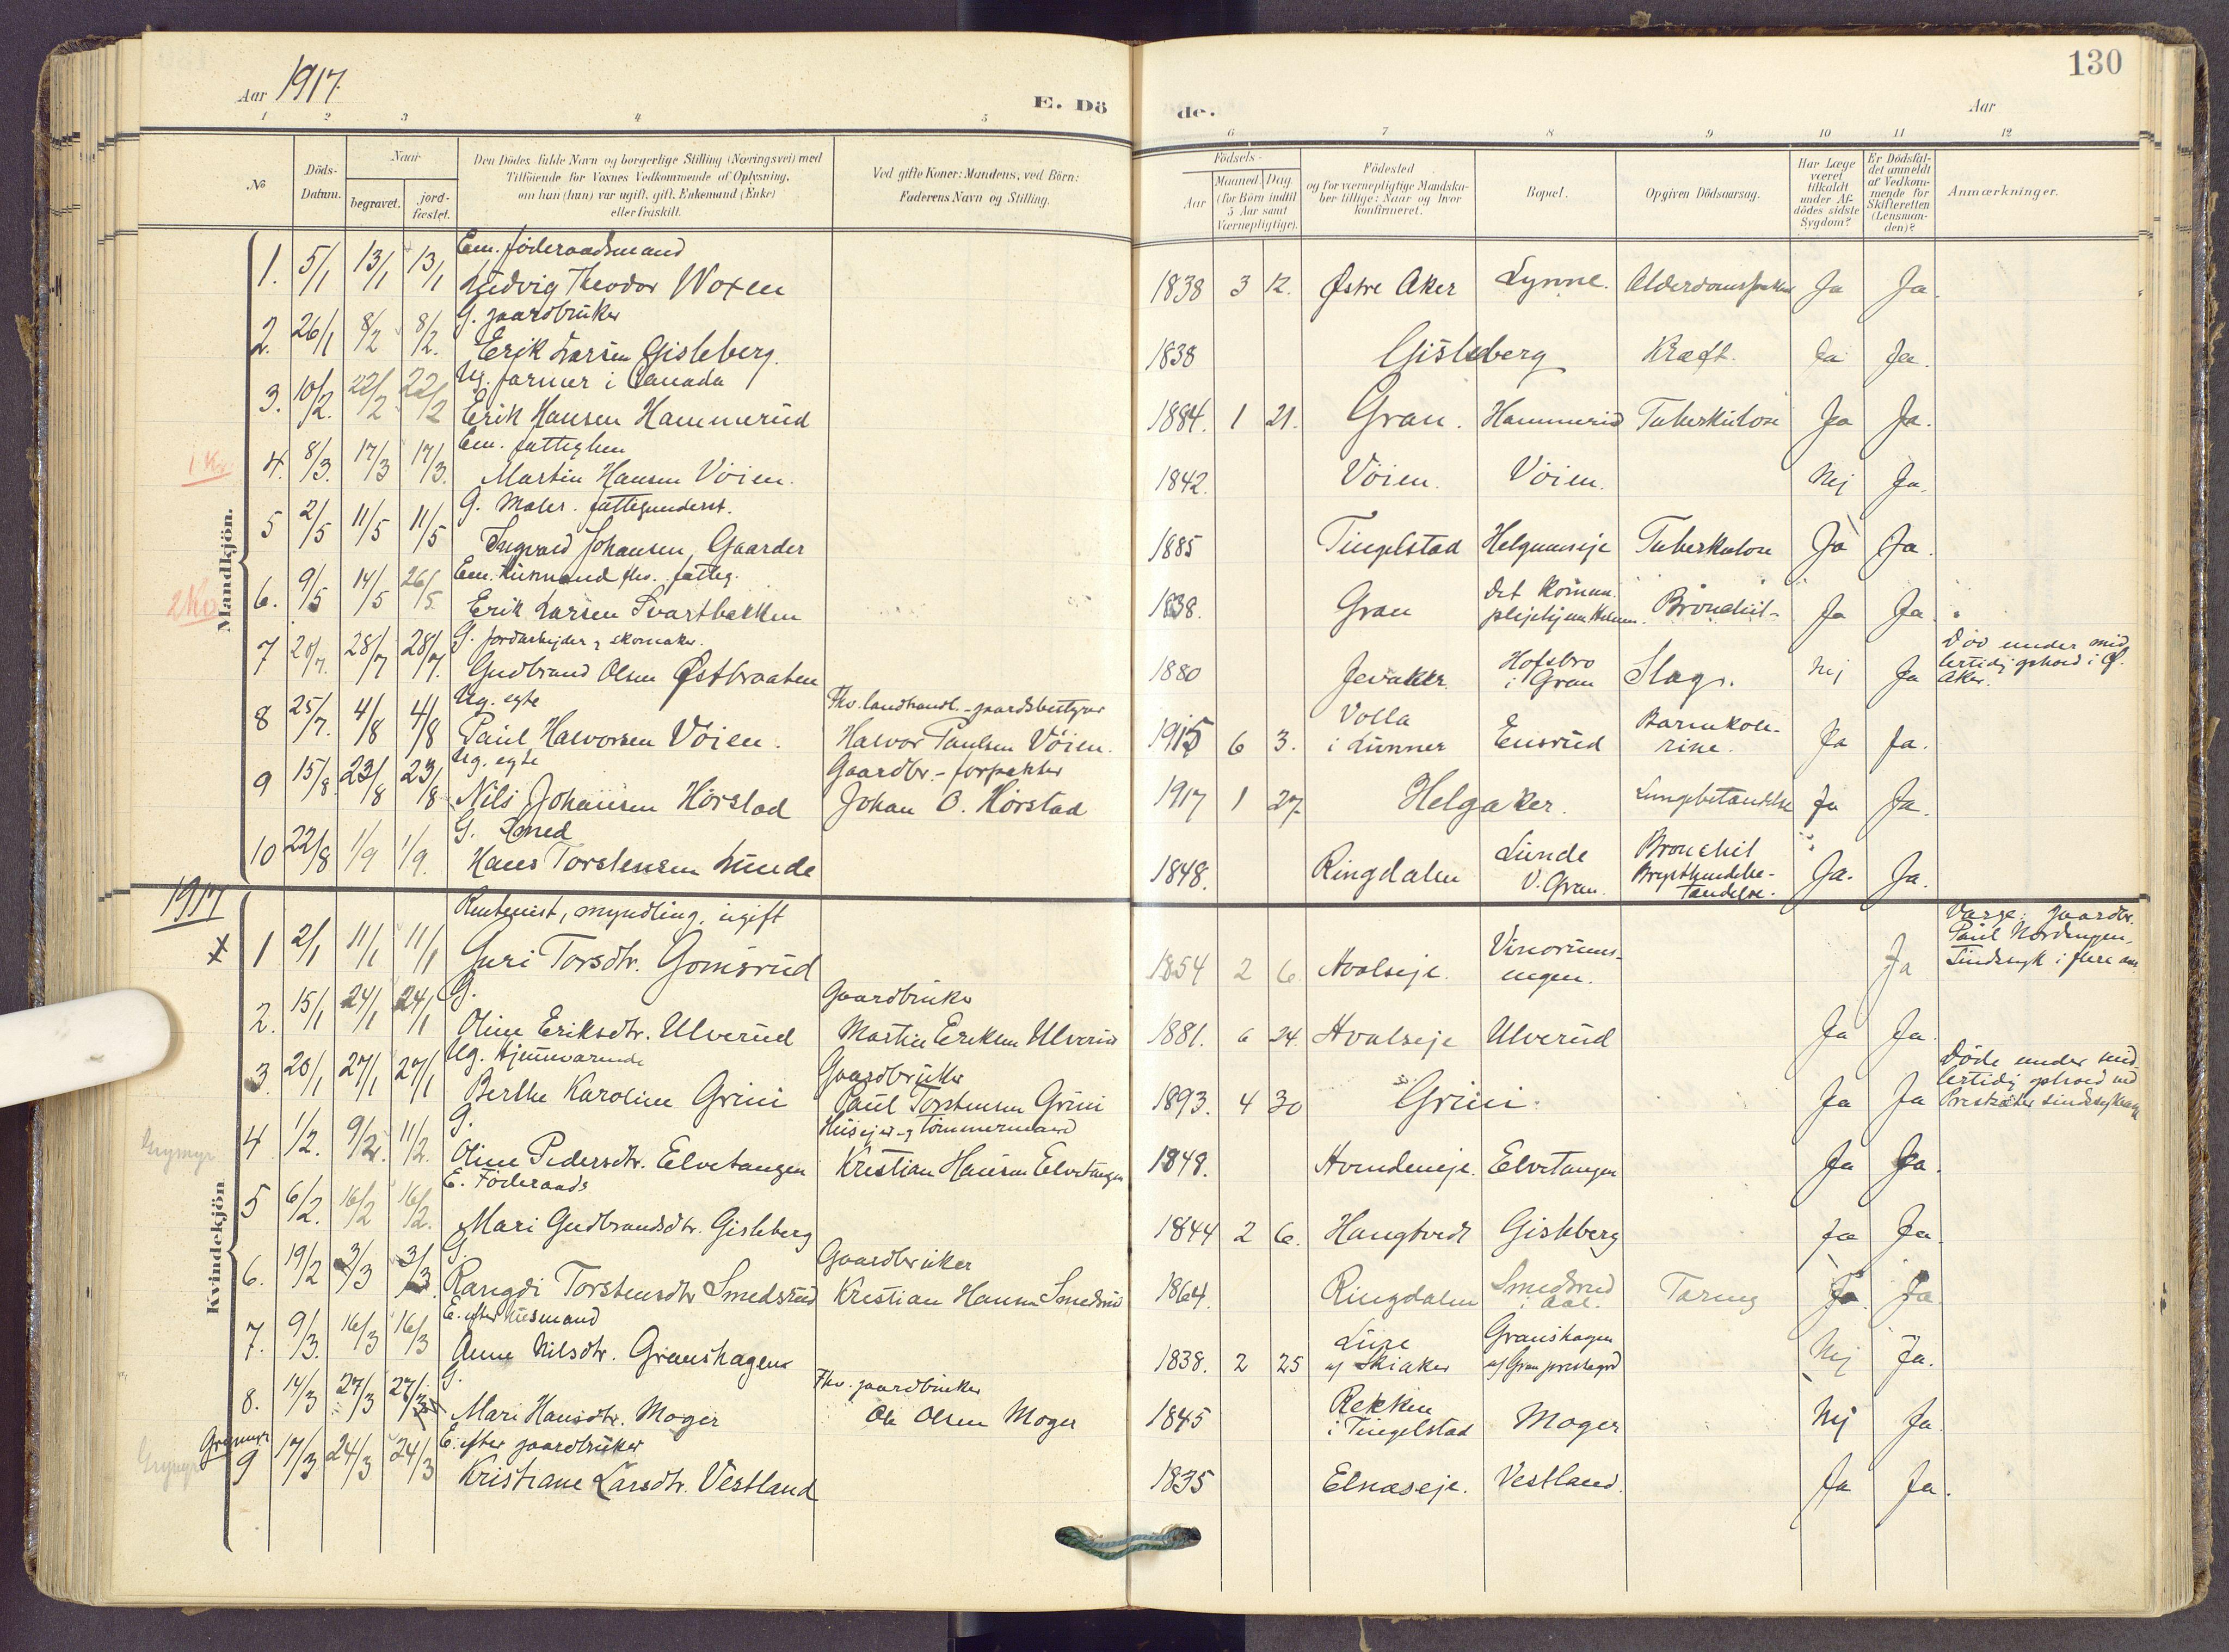 SAH, Gran prestekontor, Ministerialbok nr. 22, 1908-1918, s. 130